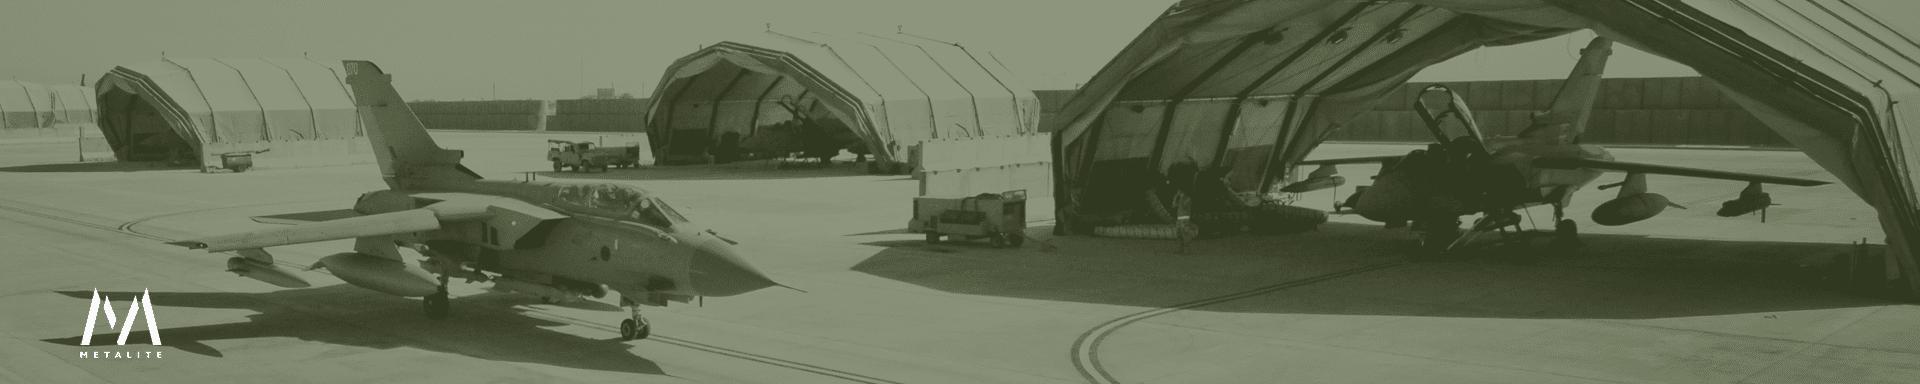 military_airfield_header60